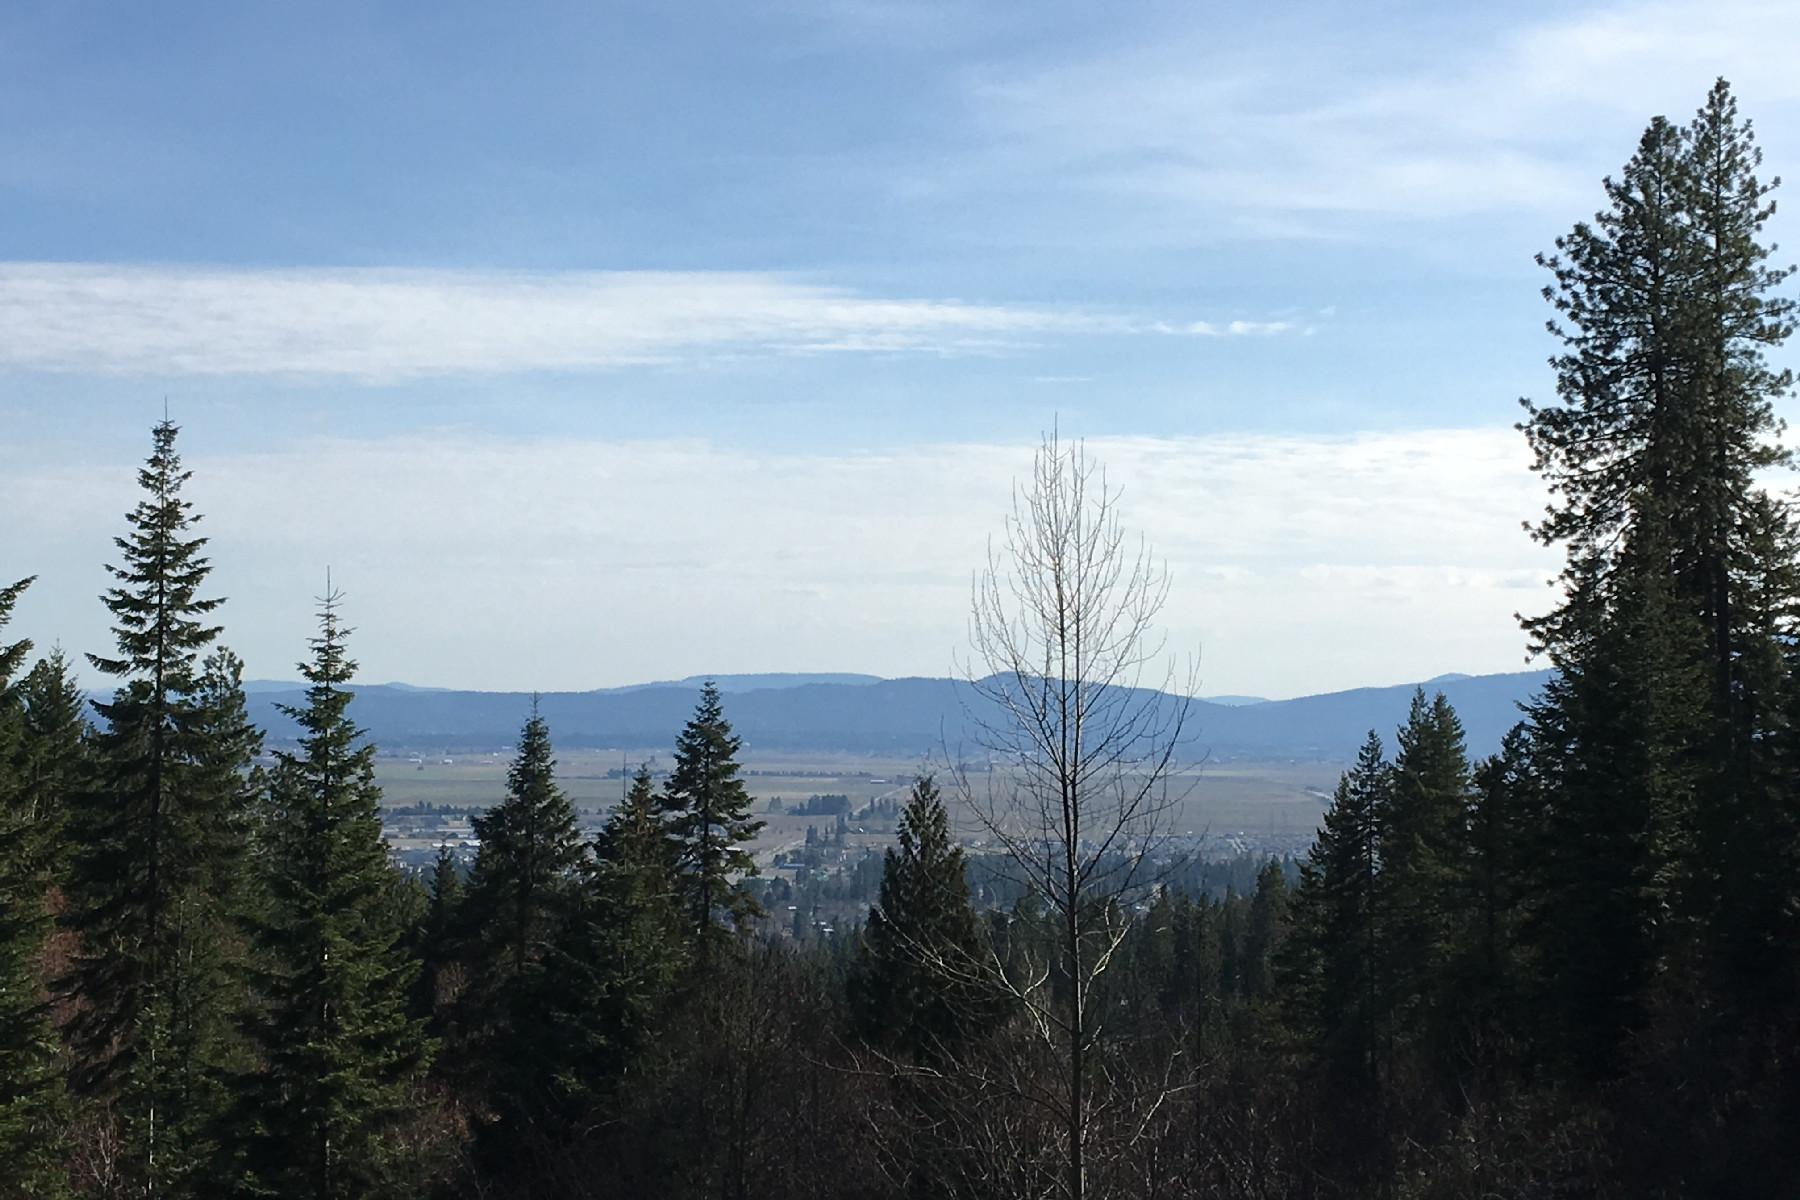 Terreno para Venda às 20 Acre property with stunning views 0 N Reservoir Rd Rathdrum, Idaho, 83858 Estados Unidos